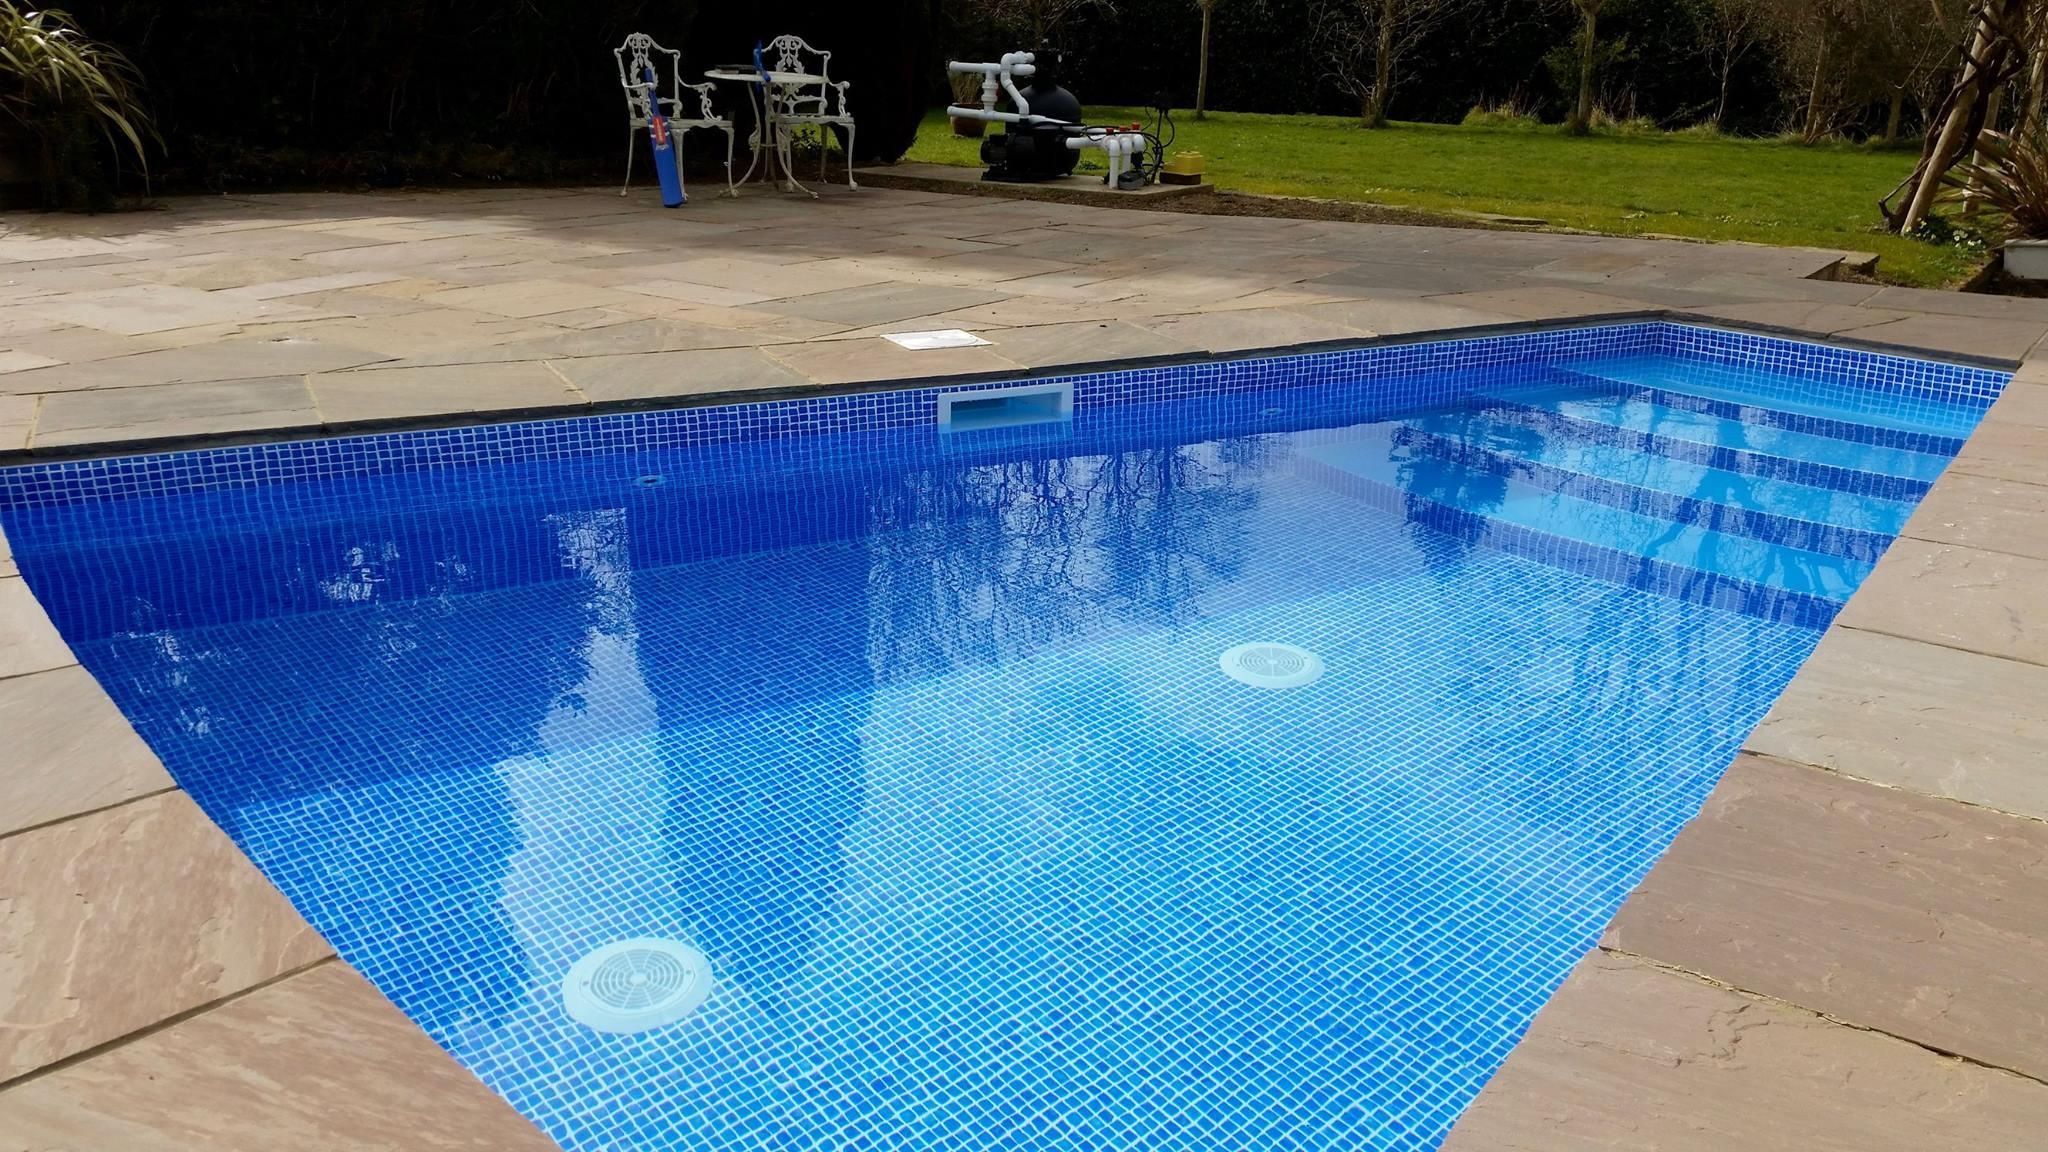 Homewood leisure swimming pool equipment suppliers of in - Swimming pool equipment manufacturers ...